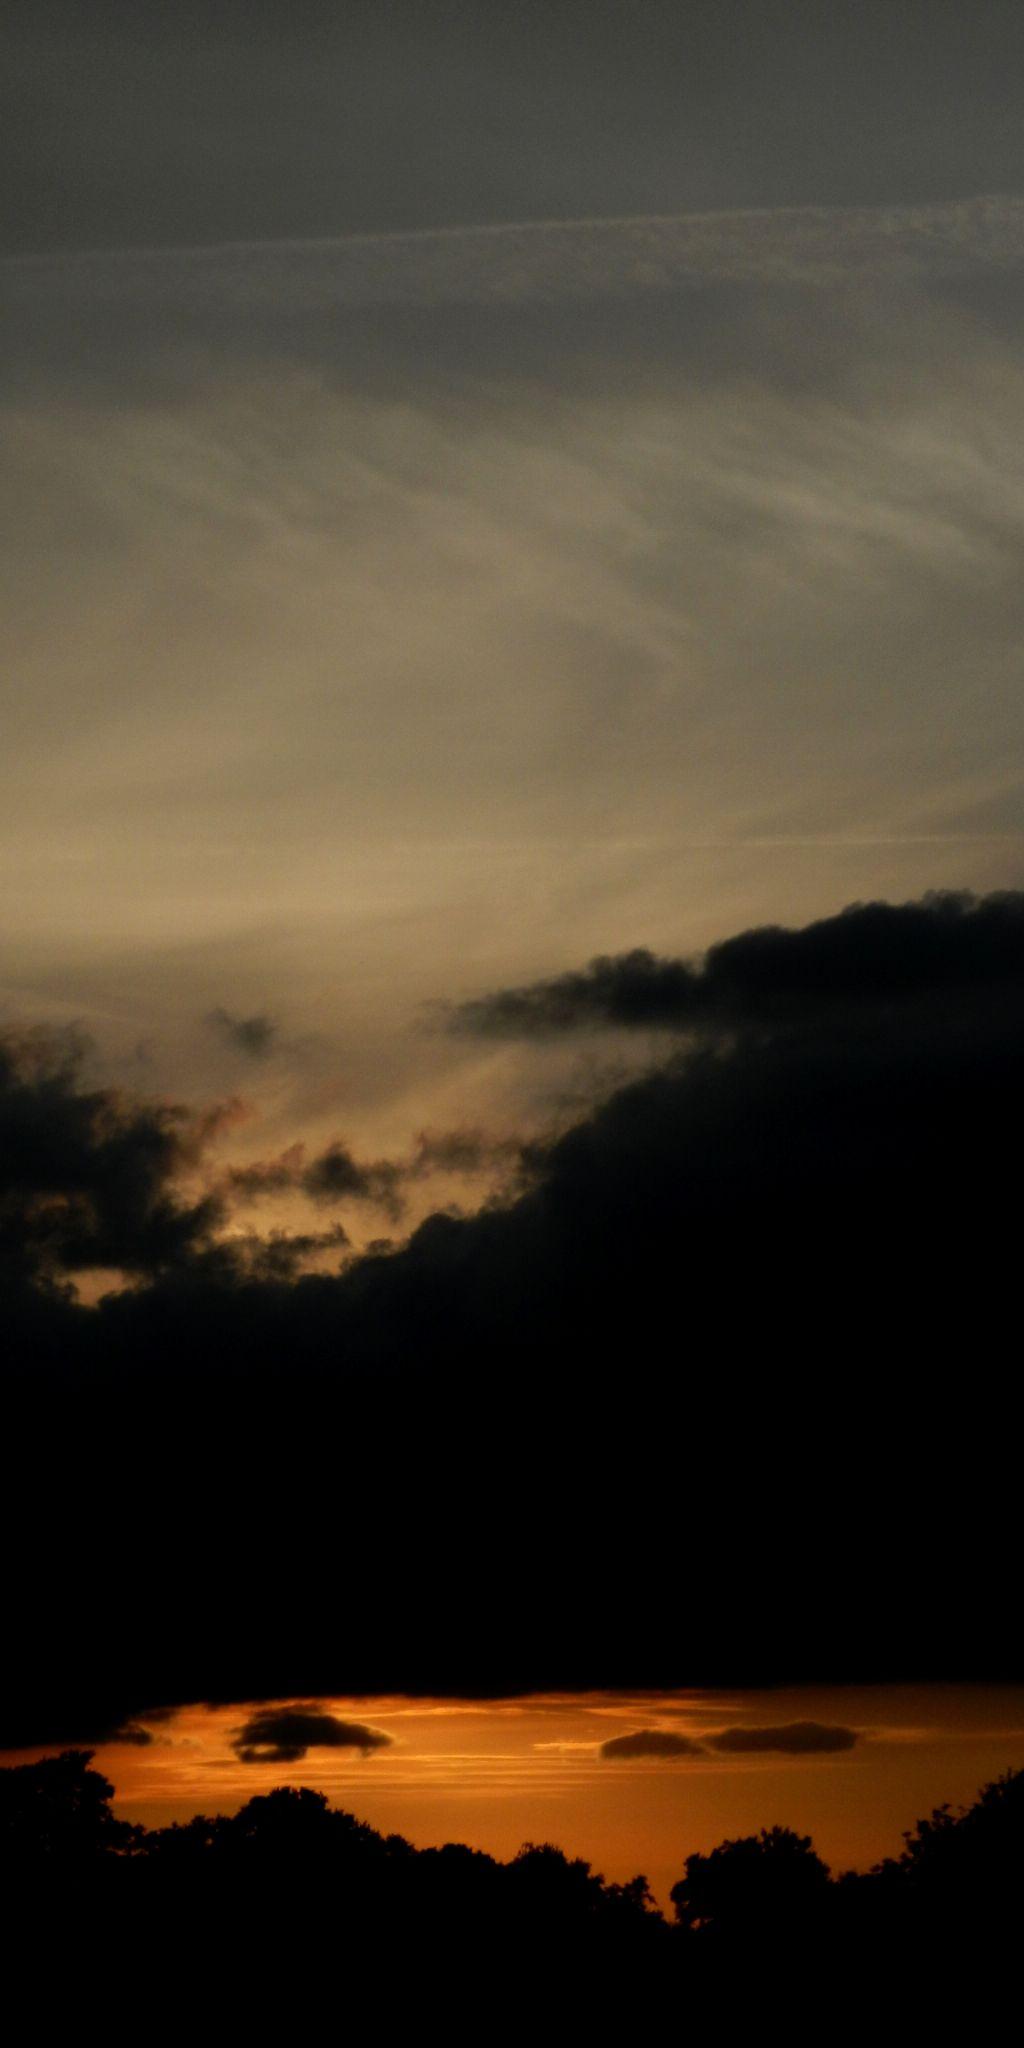 DSCN6061 le soir en deux-sèvres by pawel2reklewski